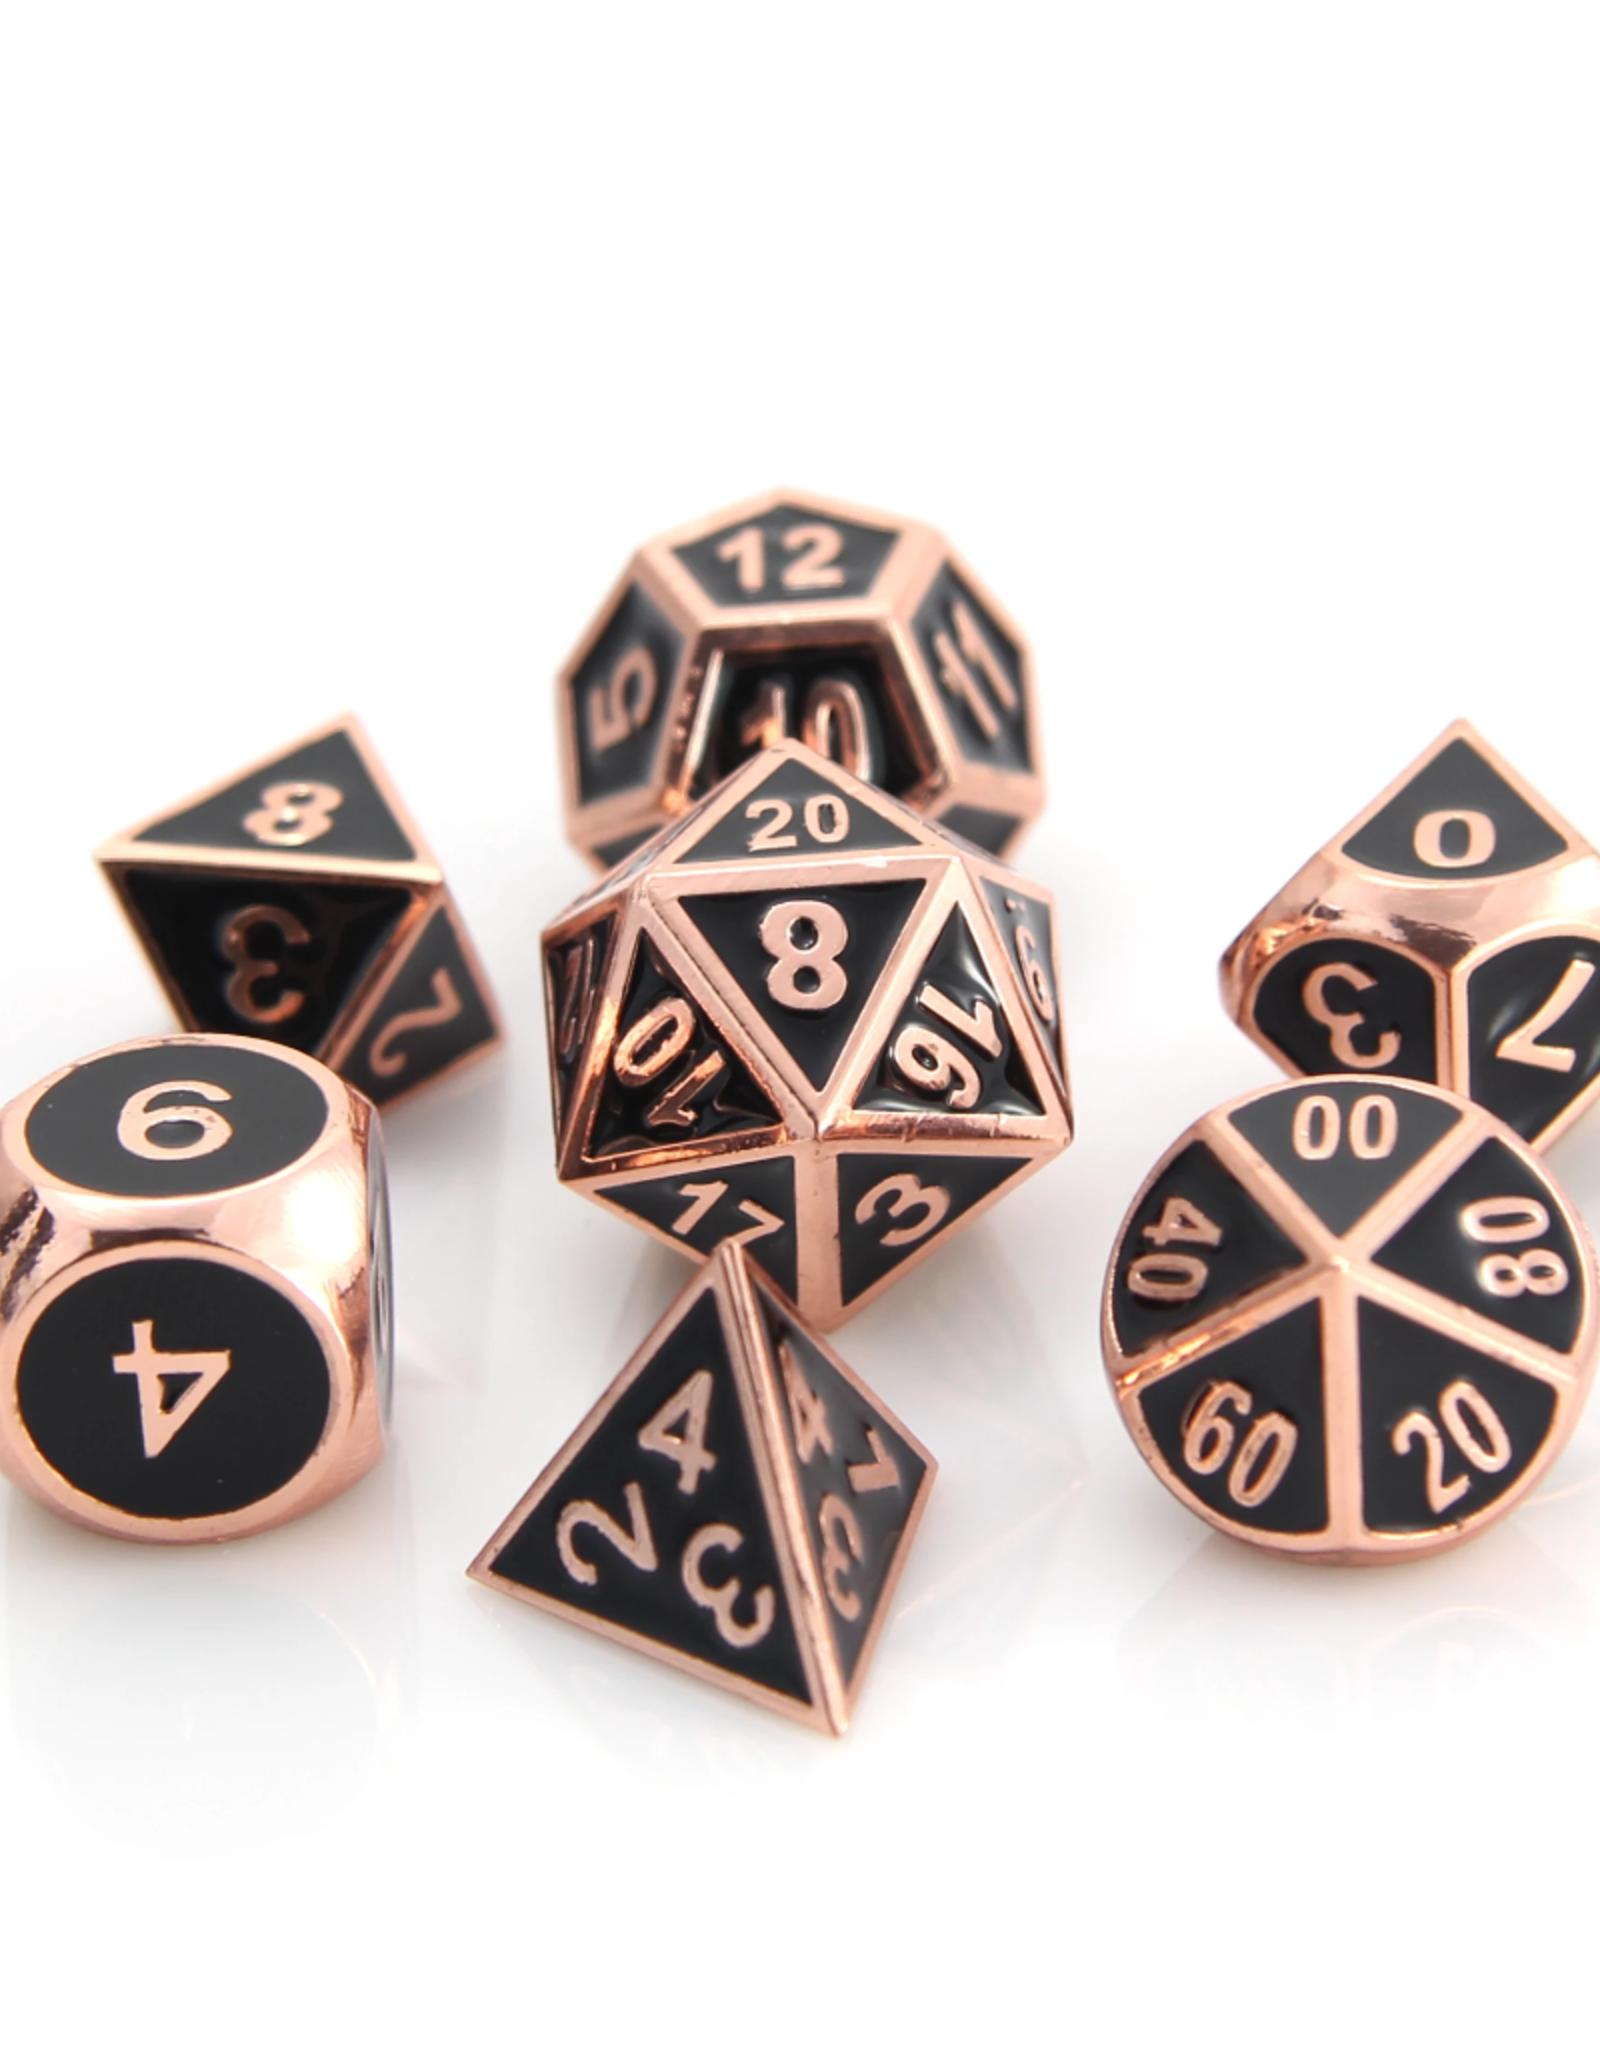 Die Hard RPG Gothica Set - Shiny Copper w/ Black